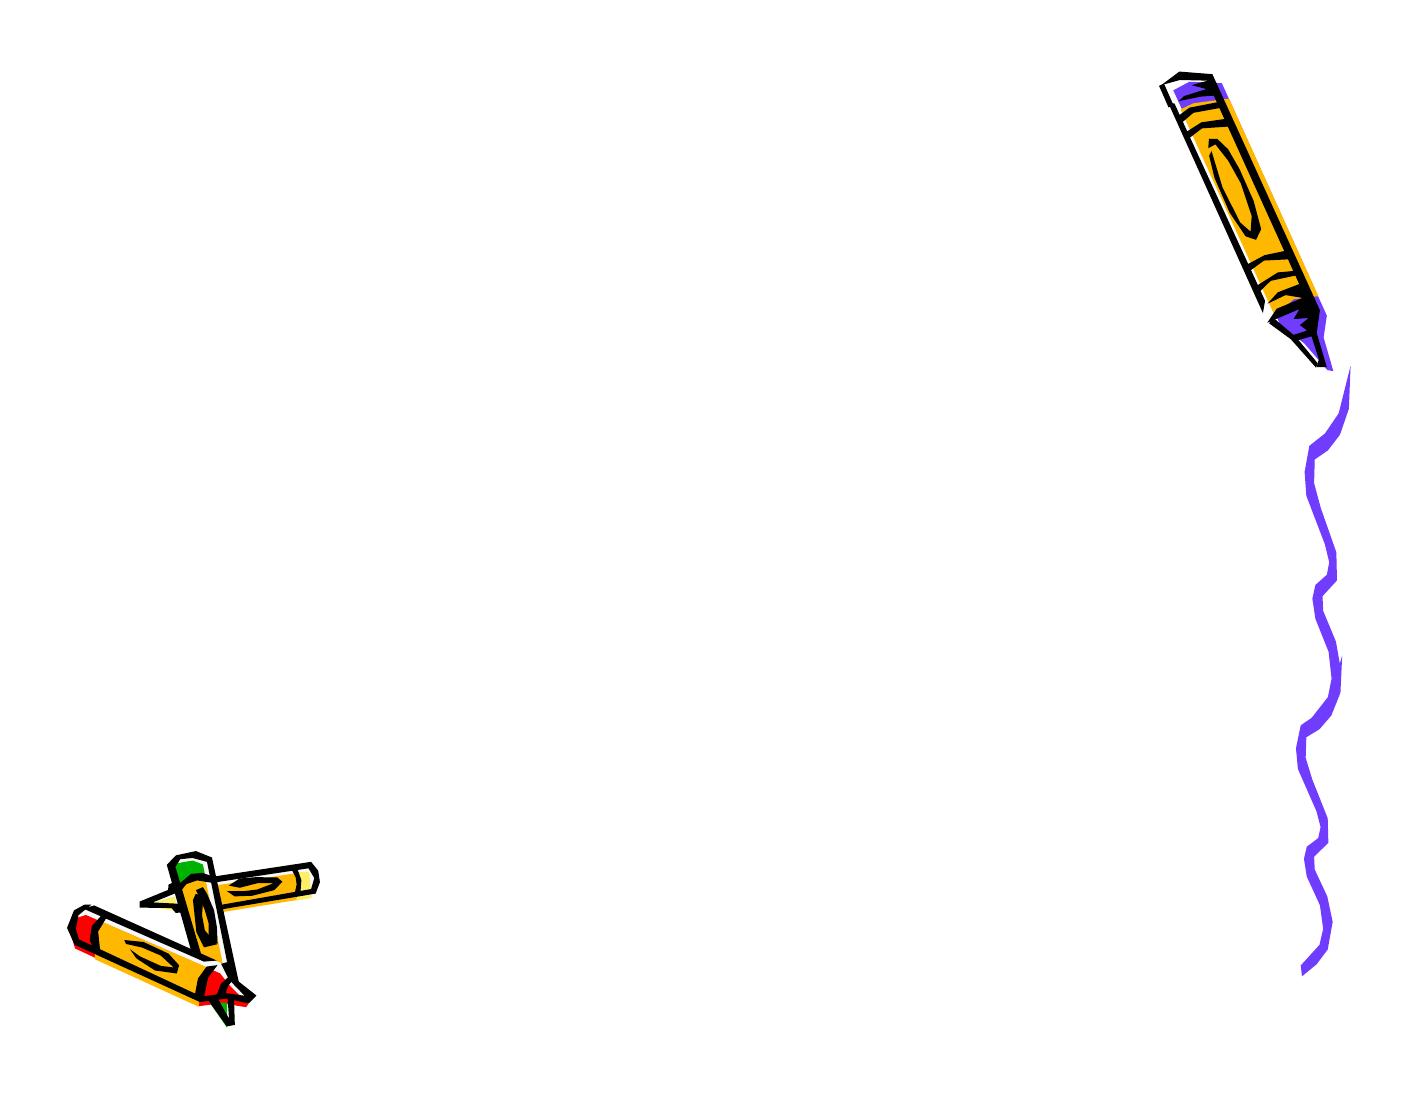 coreta�̶̲̥�nk�̲̣̥ kumpulan baground dan animasi bergerak